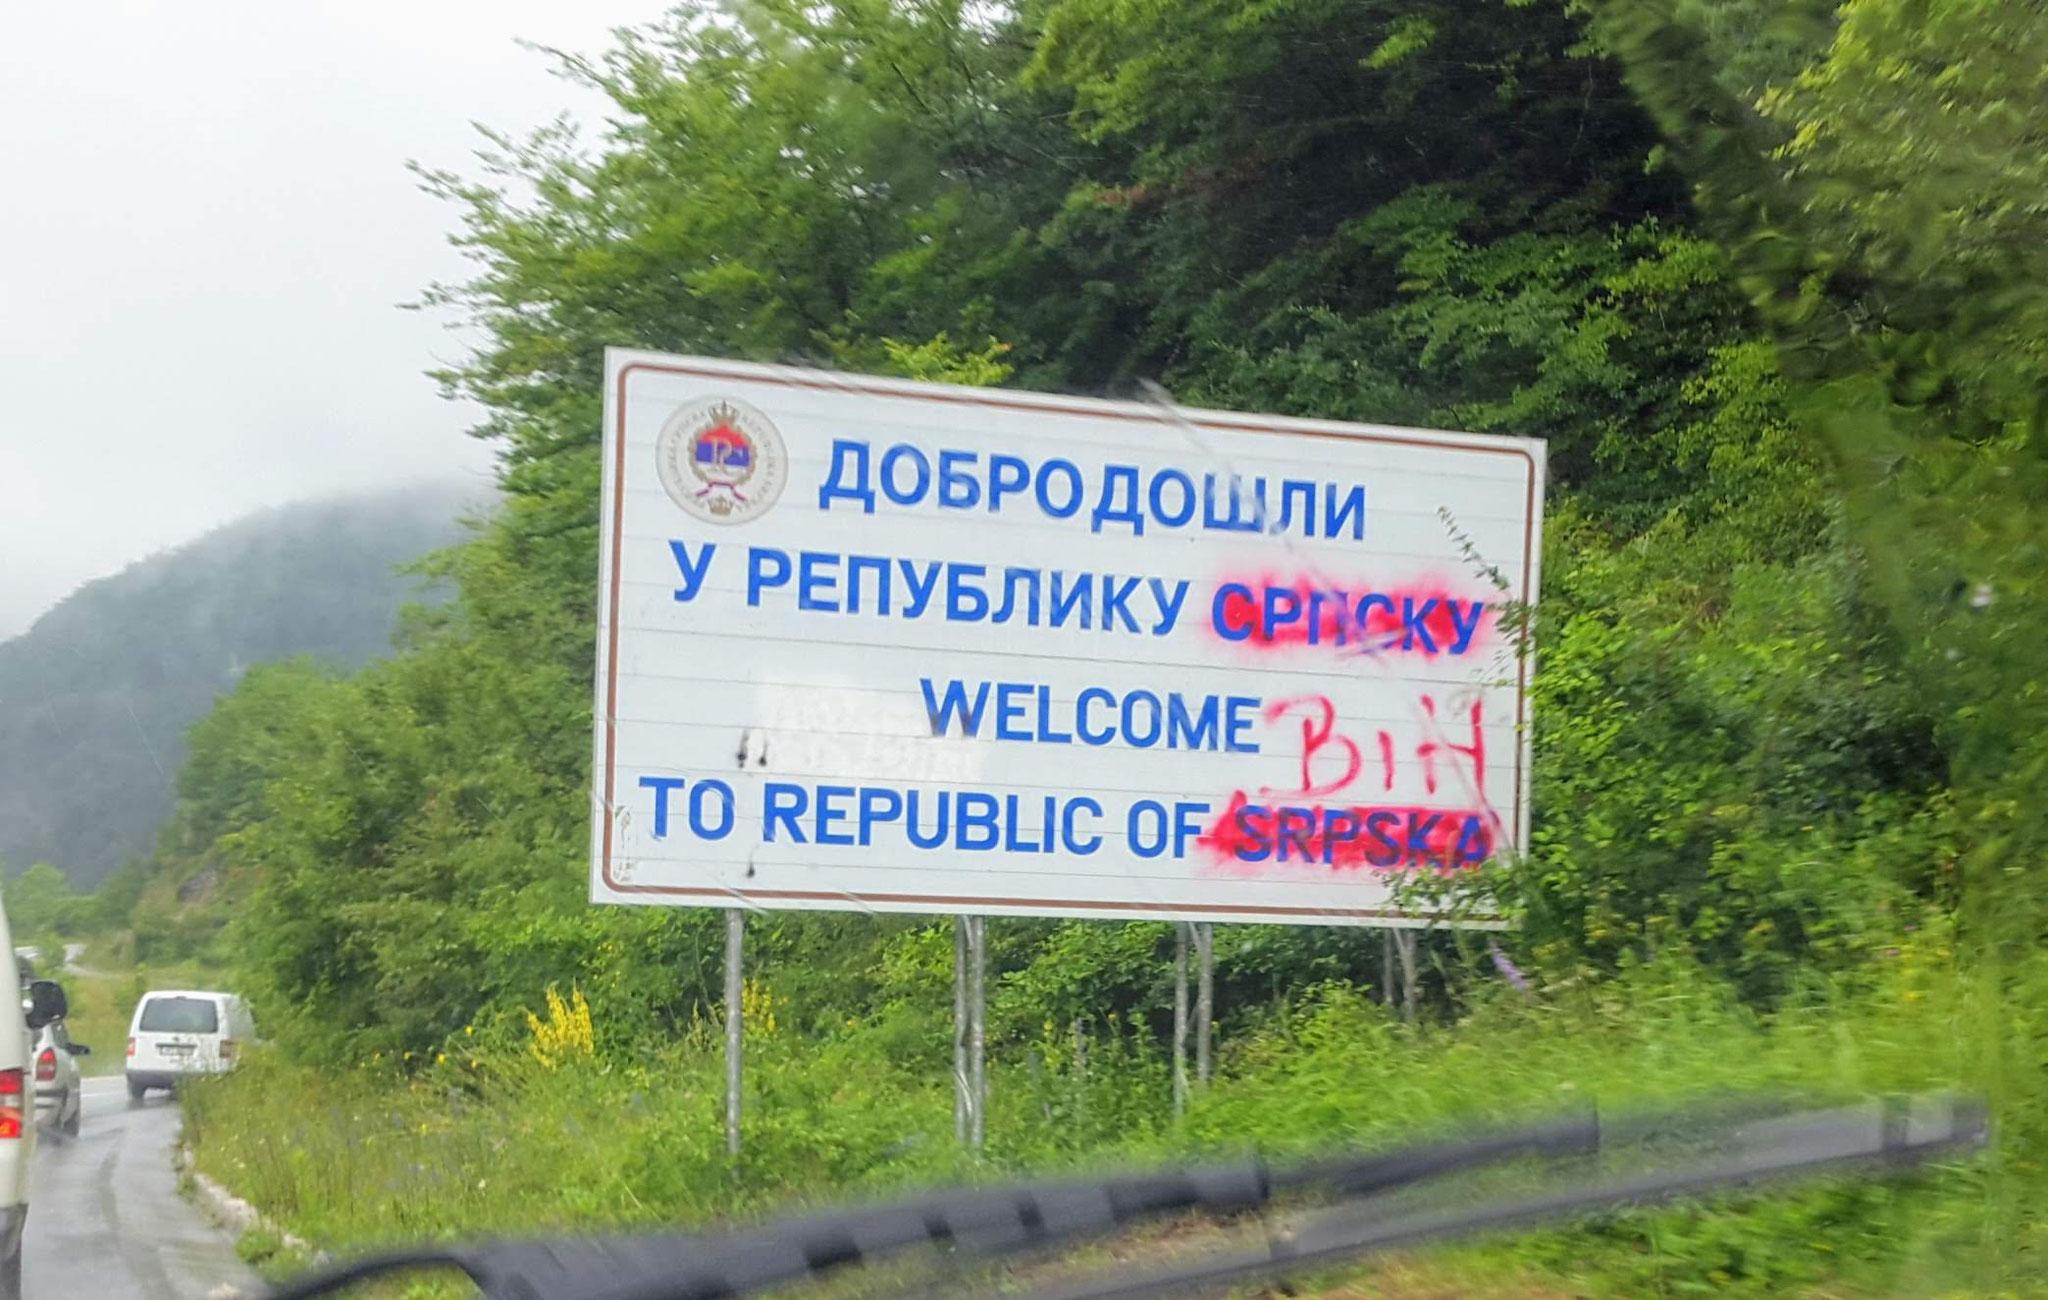 Politisches Graffiti